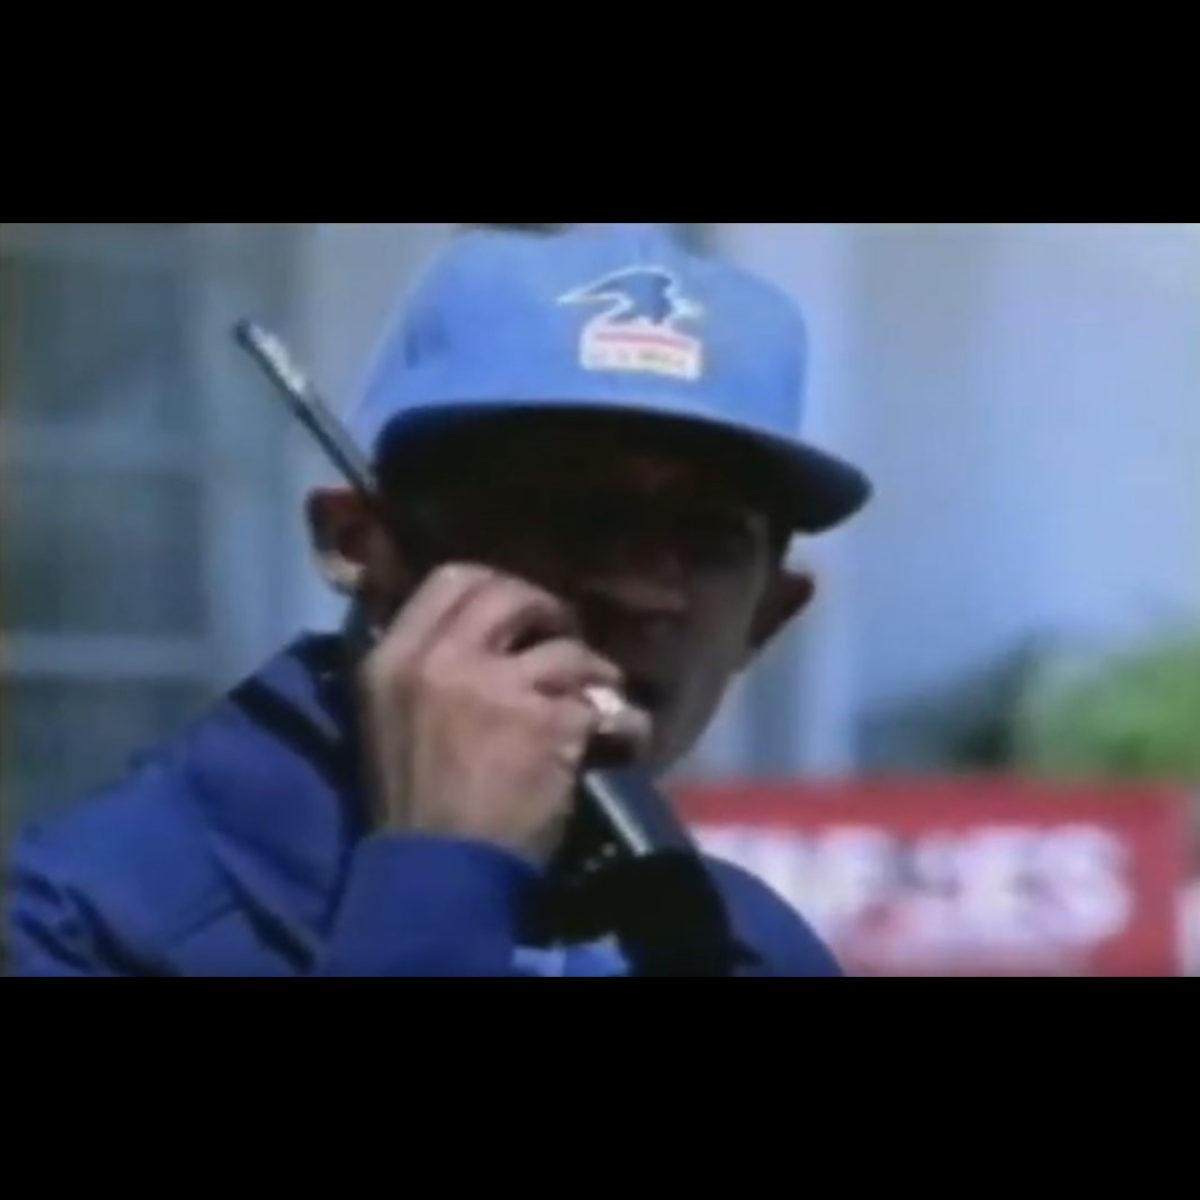 2Pac - Made Niggaz (ft. Outlawz) (Piggie Version) (Thumbnail)